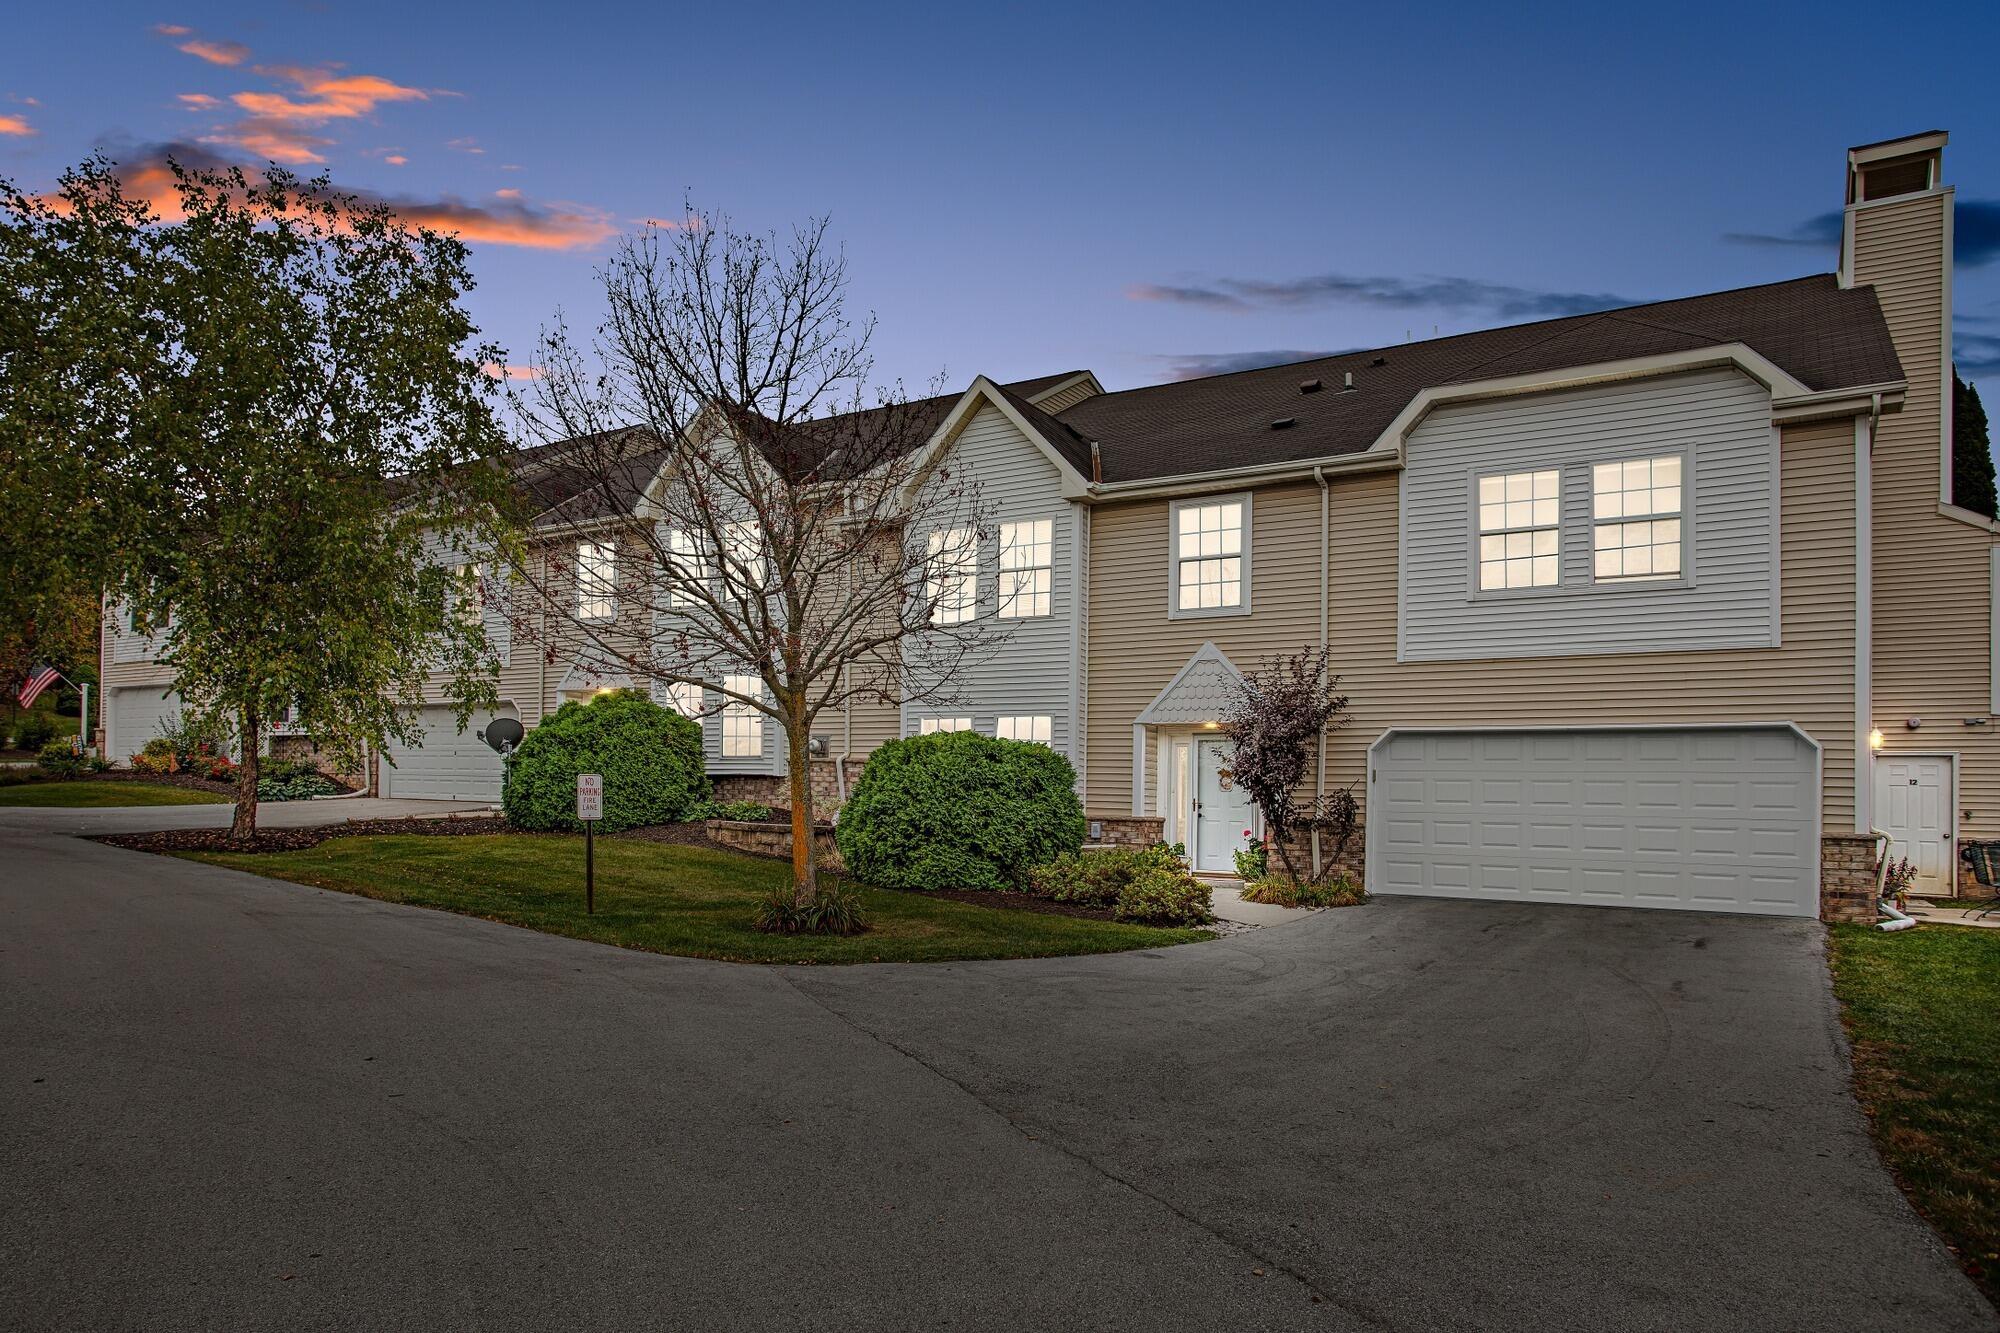 395 Lindsay Ln, Brookfield, Wisconsin 53045, 3 Bedrooms Bedrooms, 6 Rooms Rooms,2 BathroomsBathrooms,Condominiums,For Sale,Lindsay Ln,1,1766483